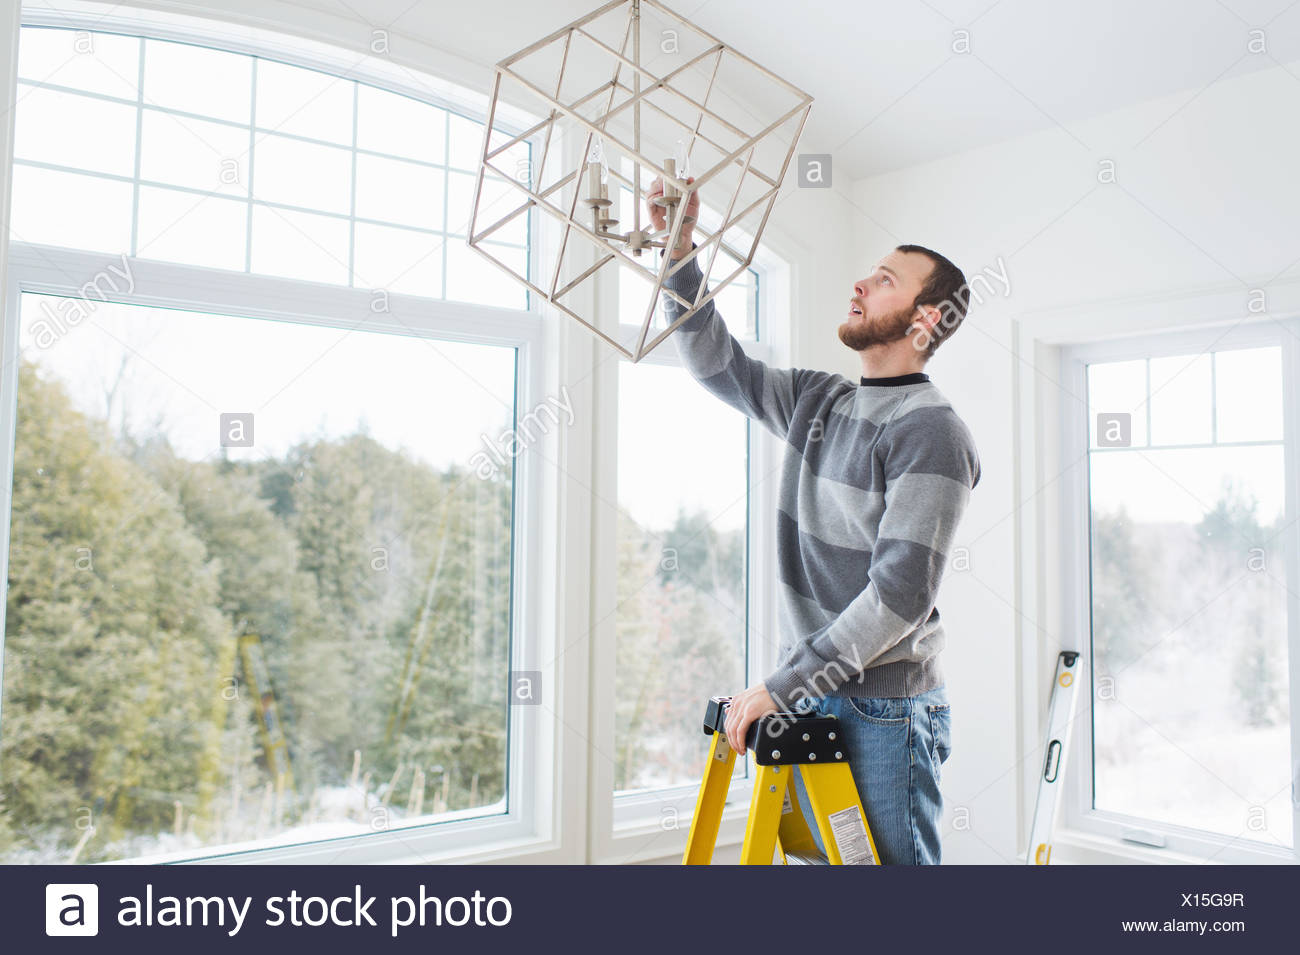 Joven instalar luces de techo Imagen De Stock